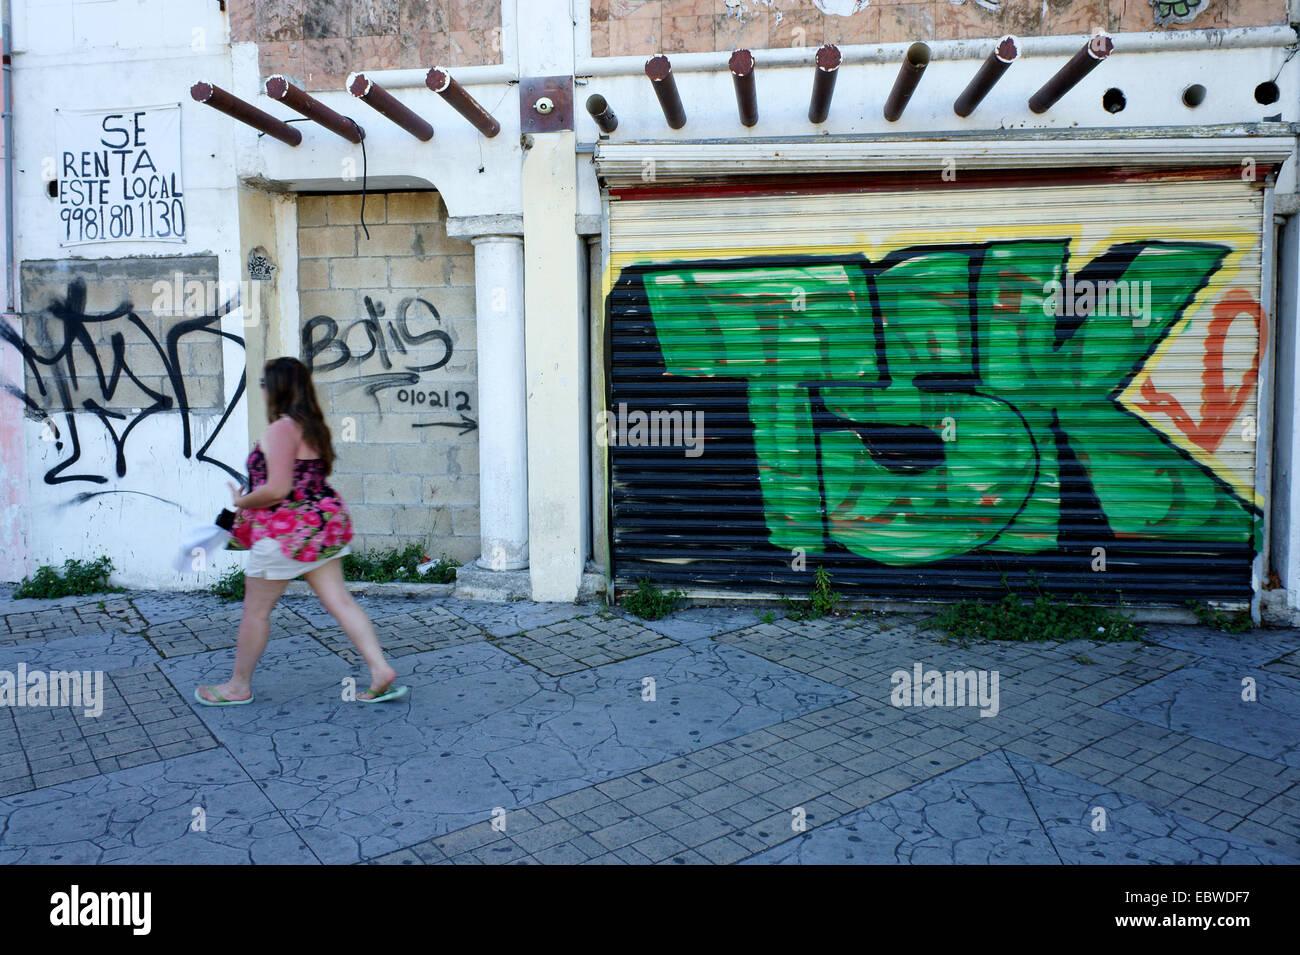 urban-graffiti-with-girl-in-flowered-dre